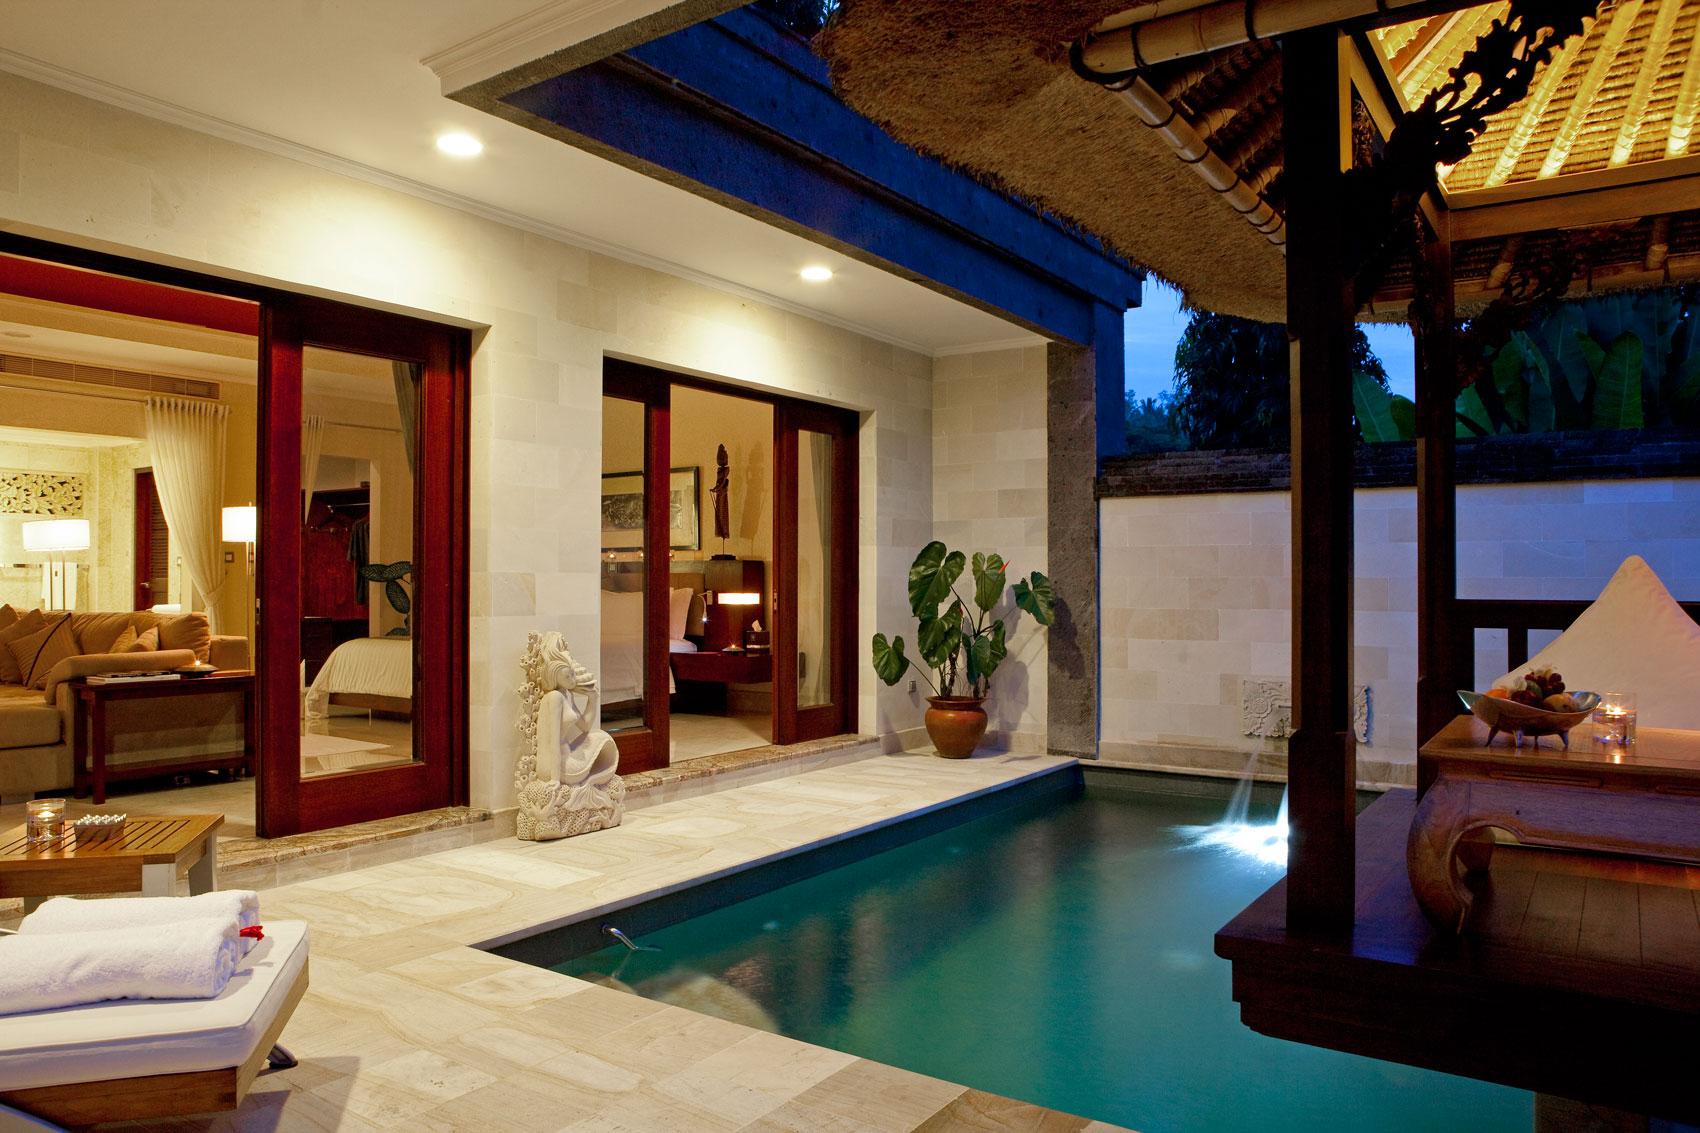 Viceroy Bali, a 5-Star Resort and Spa (44)